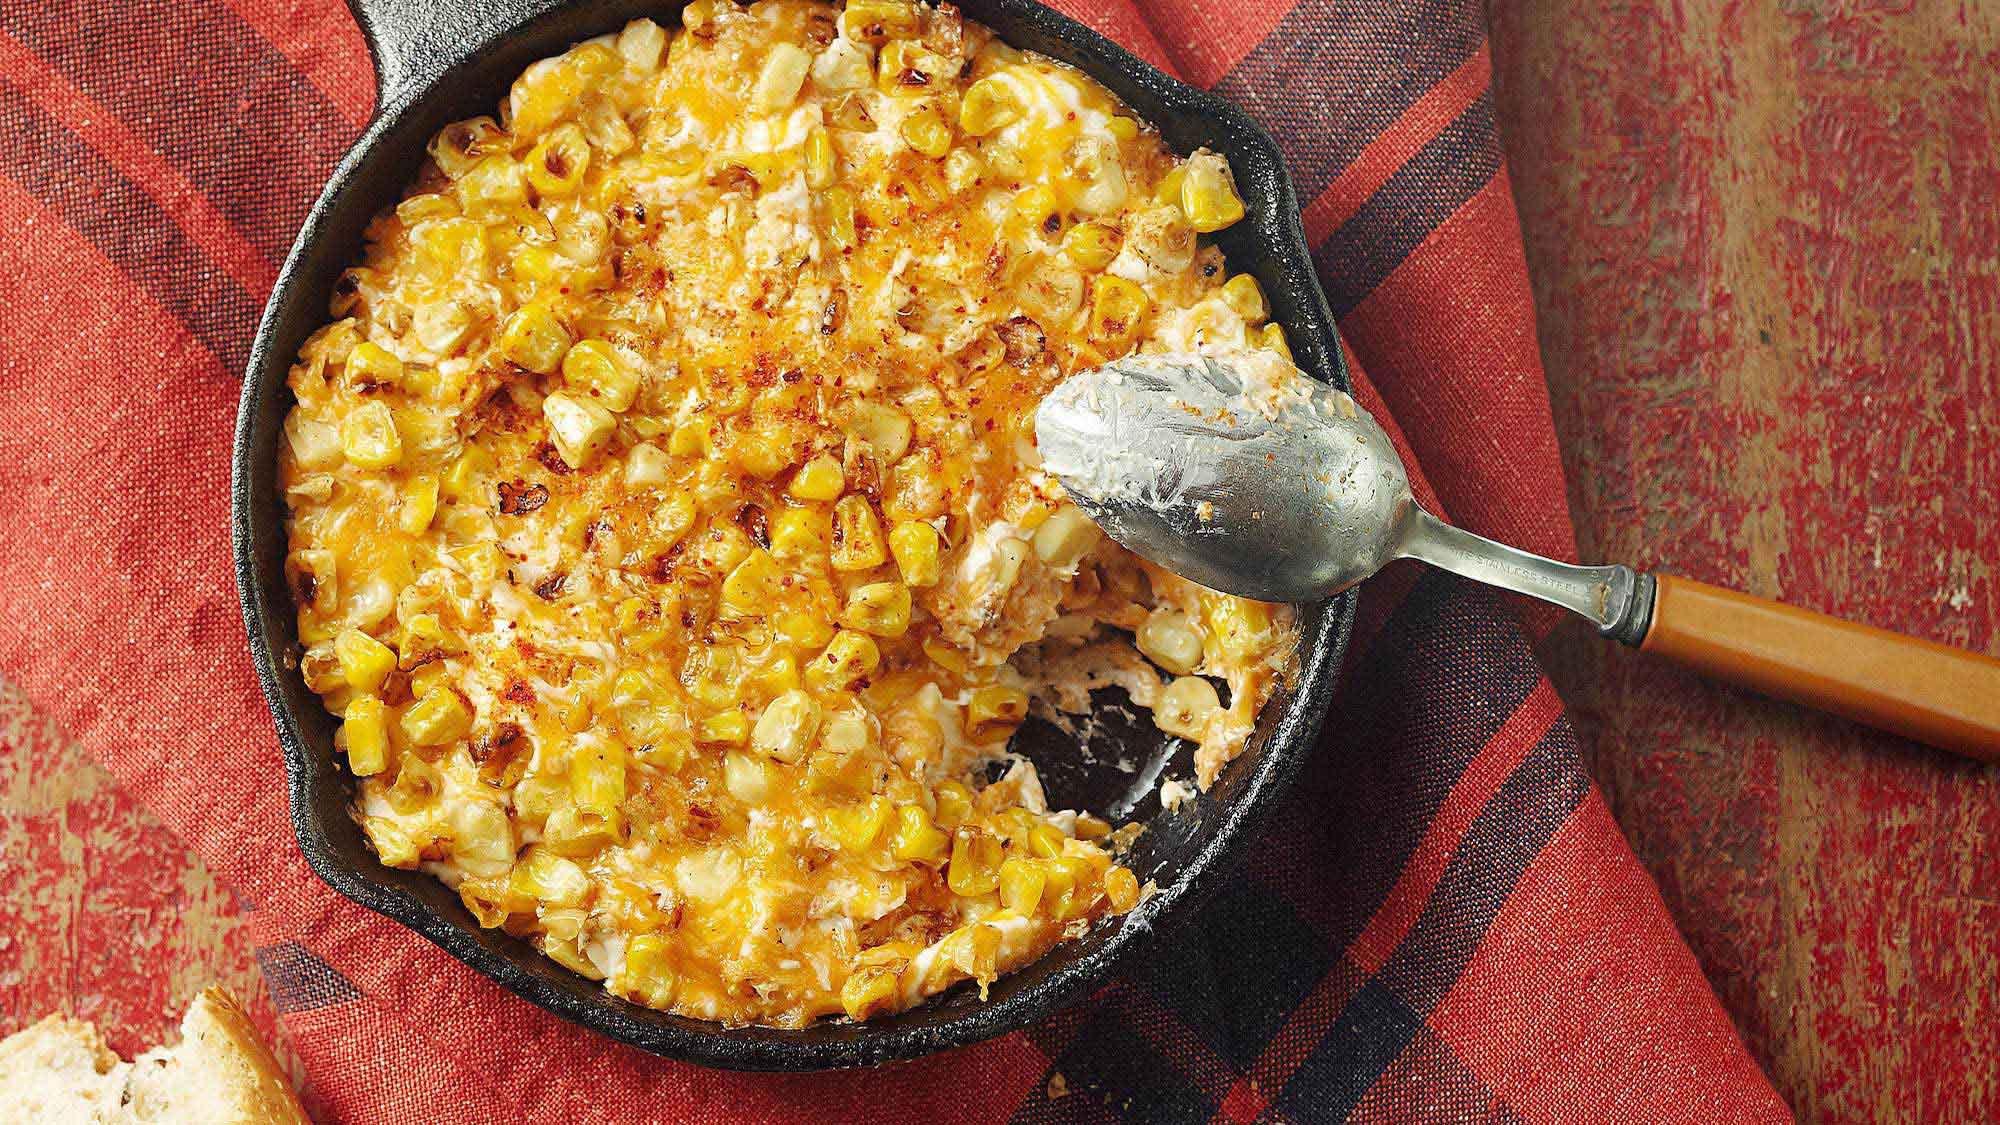 McCormick Corn Cheese Dip